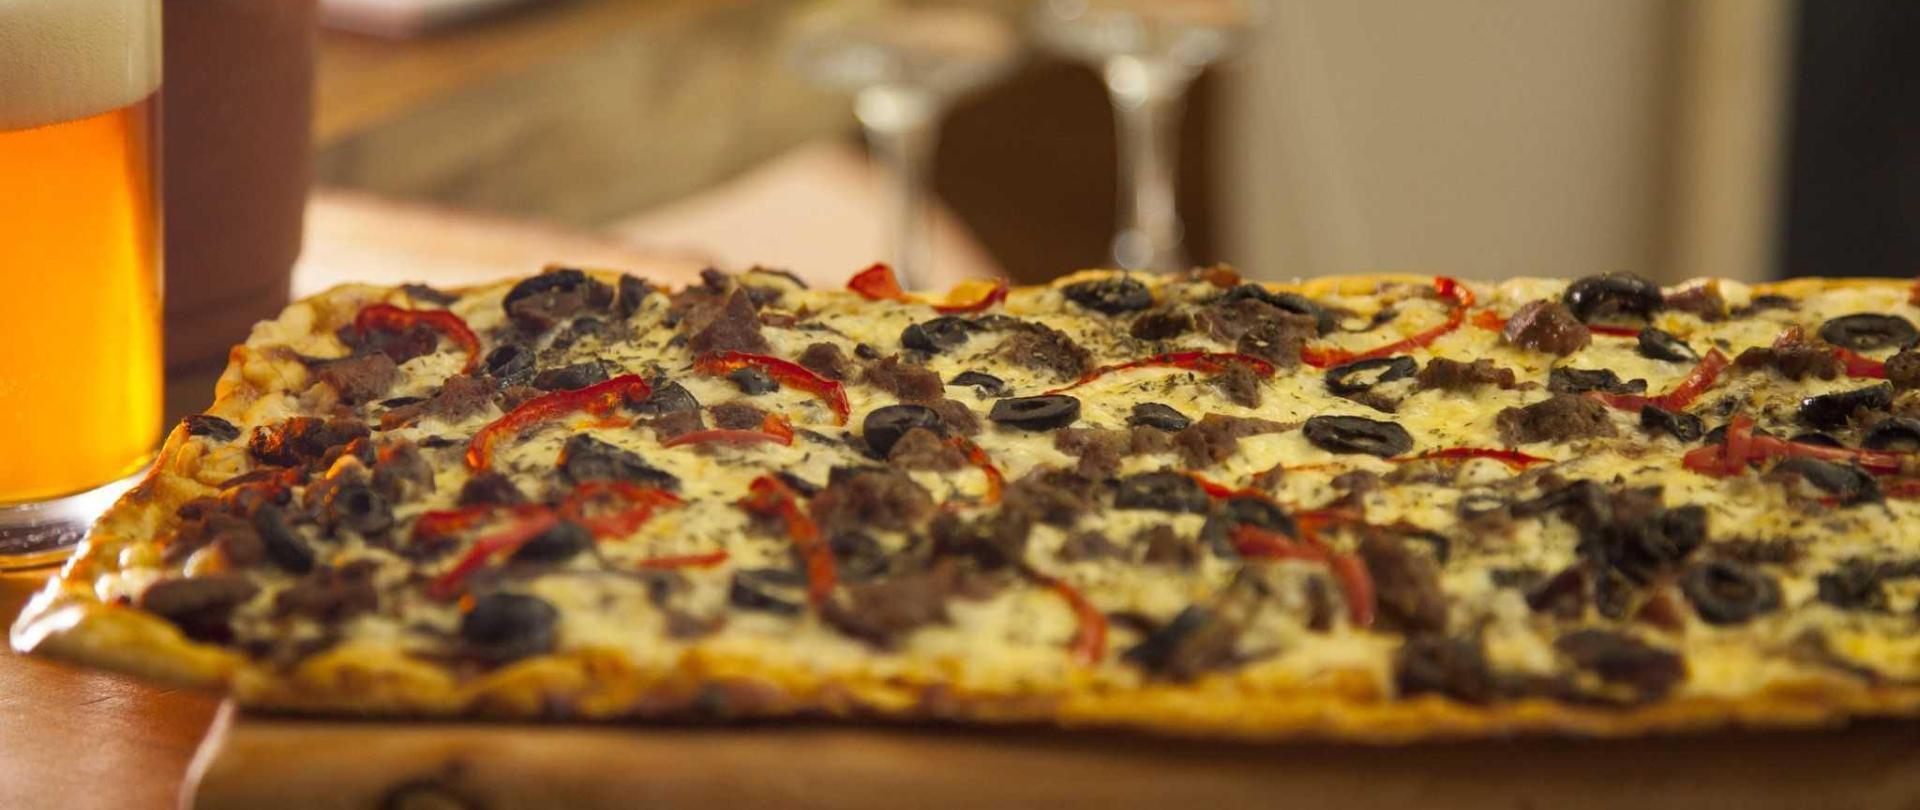 pizza-corralera.jpg